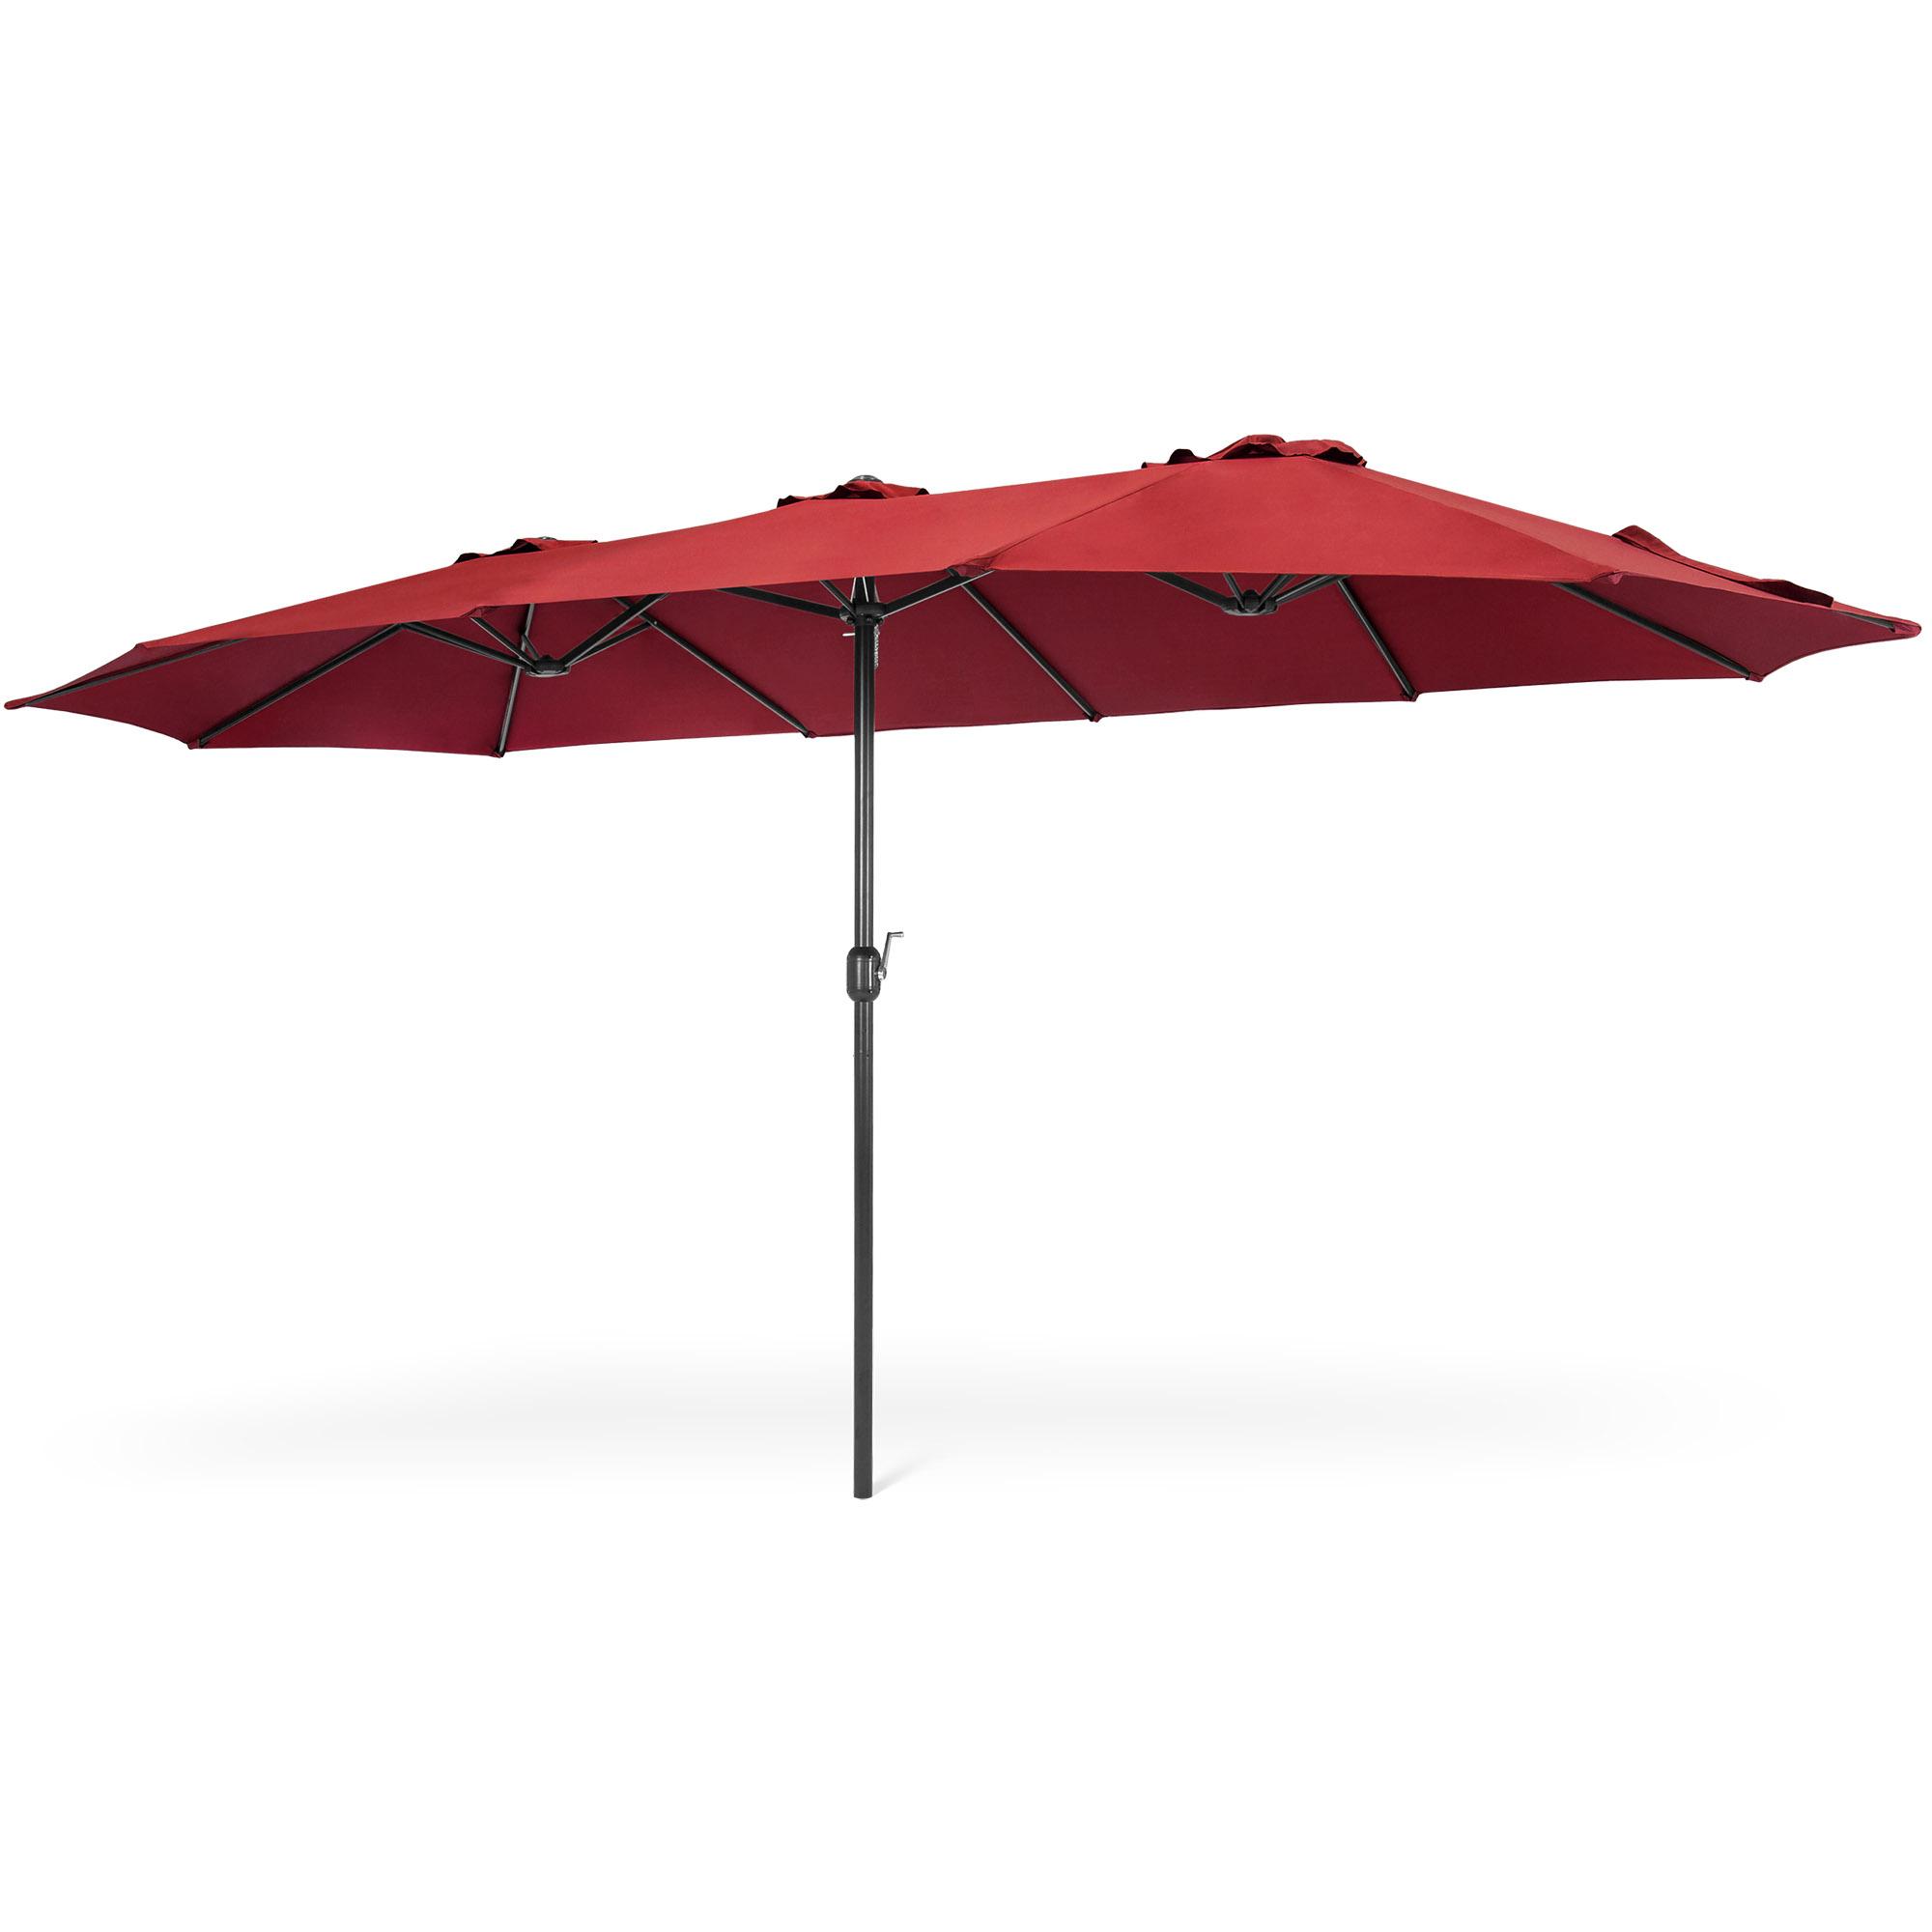 2019 Solid Rectangular Market Umbrellas With Regard To Best Choice Products 15X9Ft Large Rectangular Outdoor Aluminum Twin Patio  Market Umbrella W/ Crank, Wind Vents (View 1 of 20)